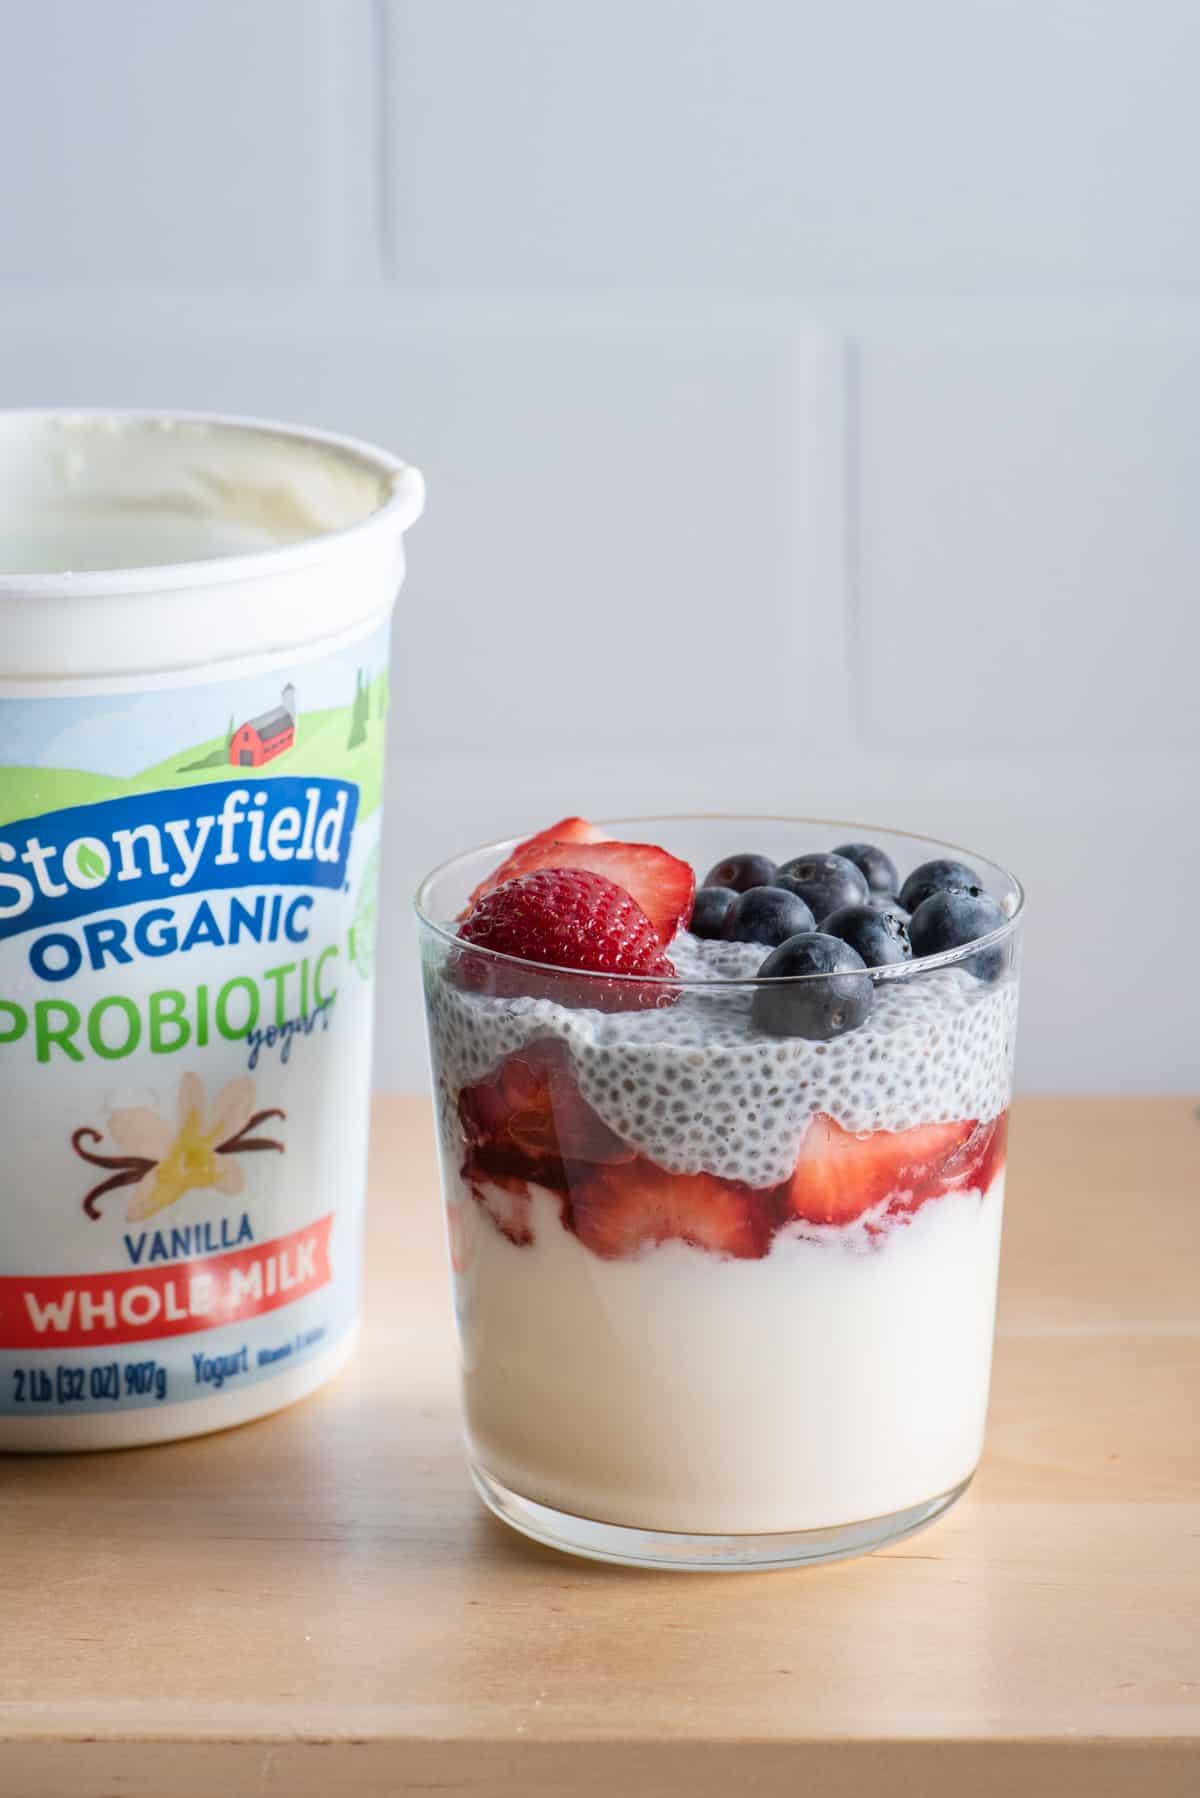 Stonyfield yogurt with yogurt chia pudding